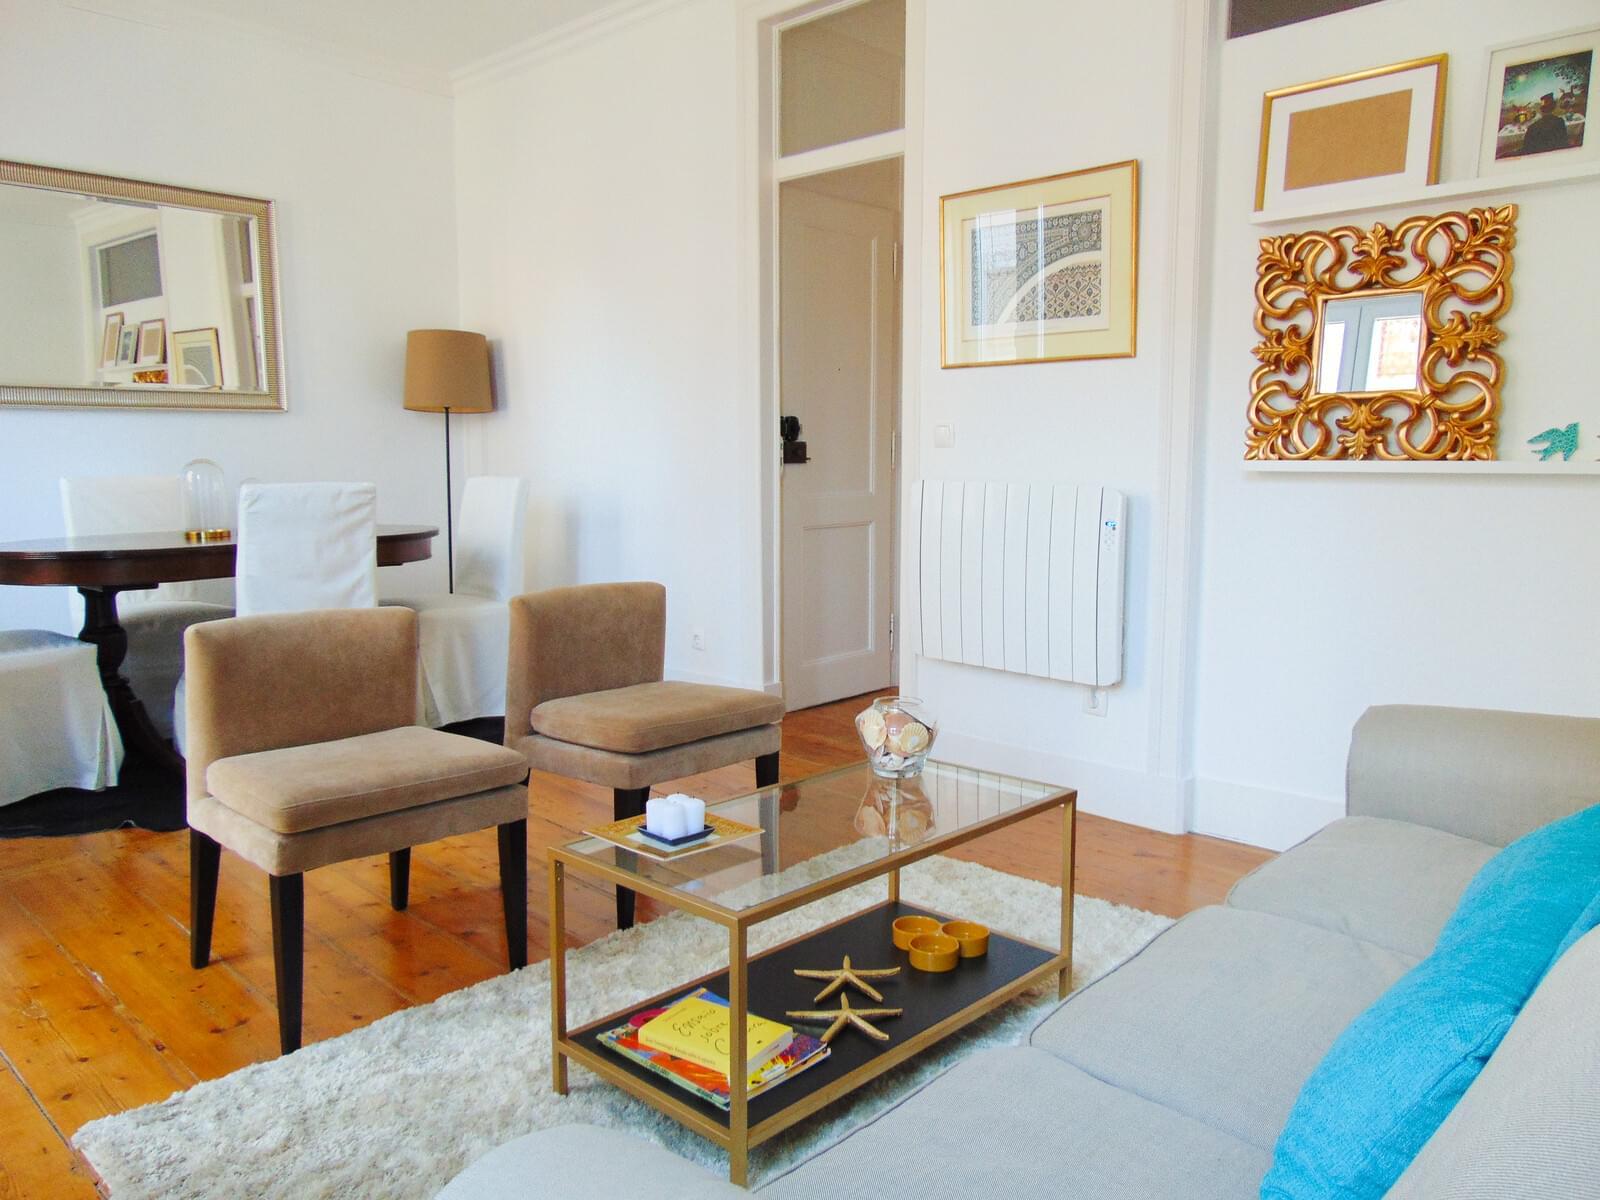 pf18269-apartamento-t1-lisboa-9404d3ee-b2ed-4330-b736-3f07c0b00720